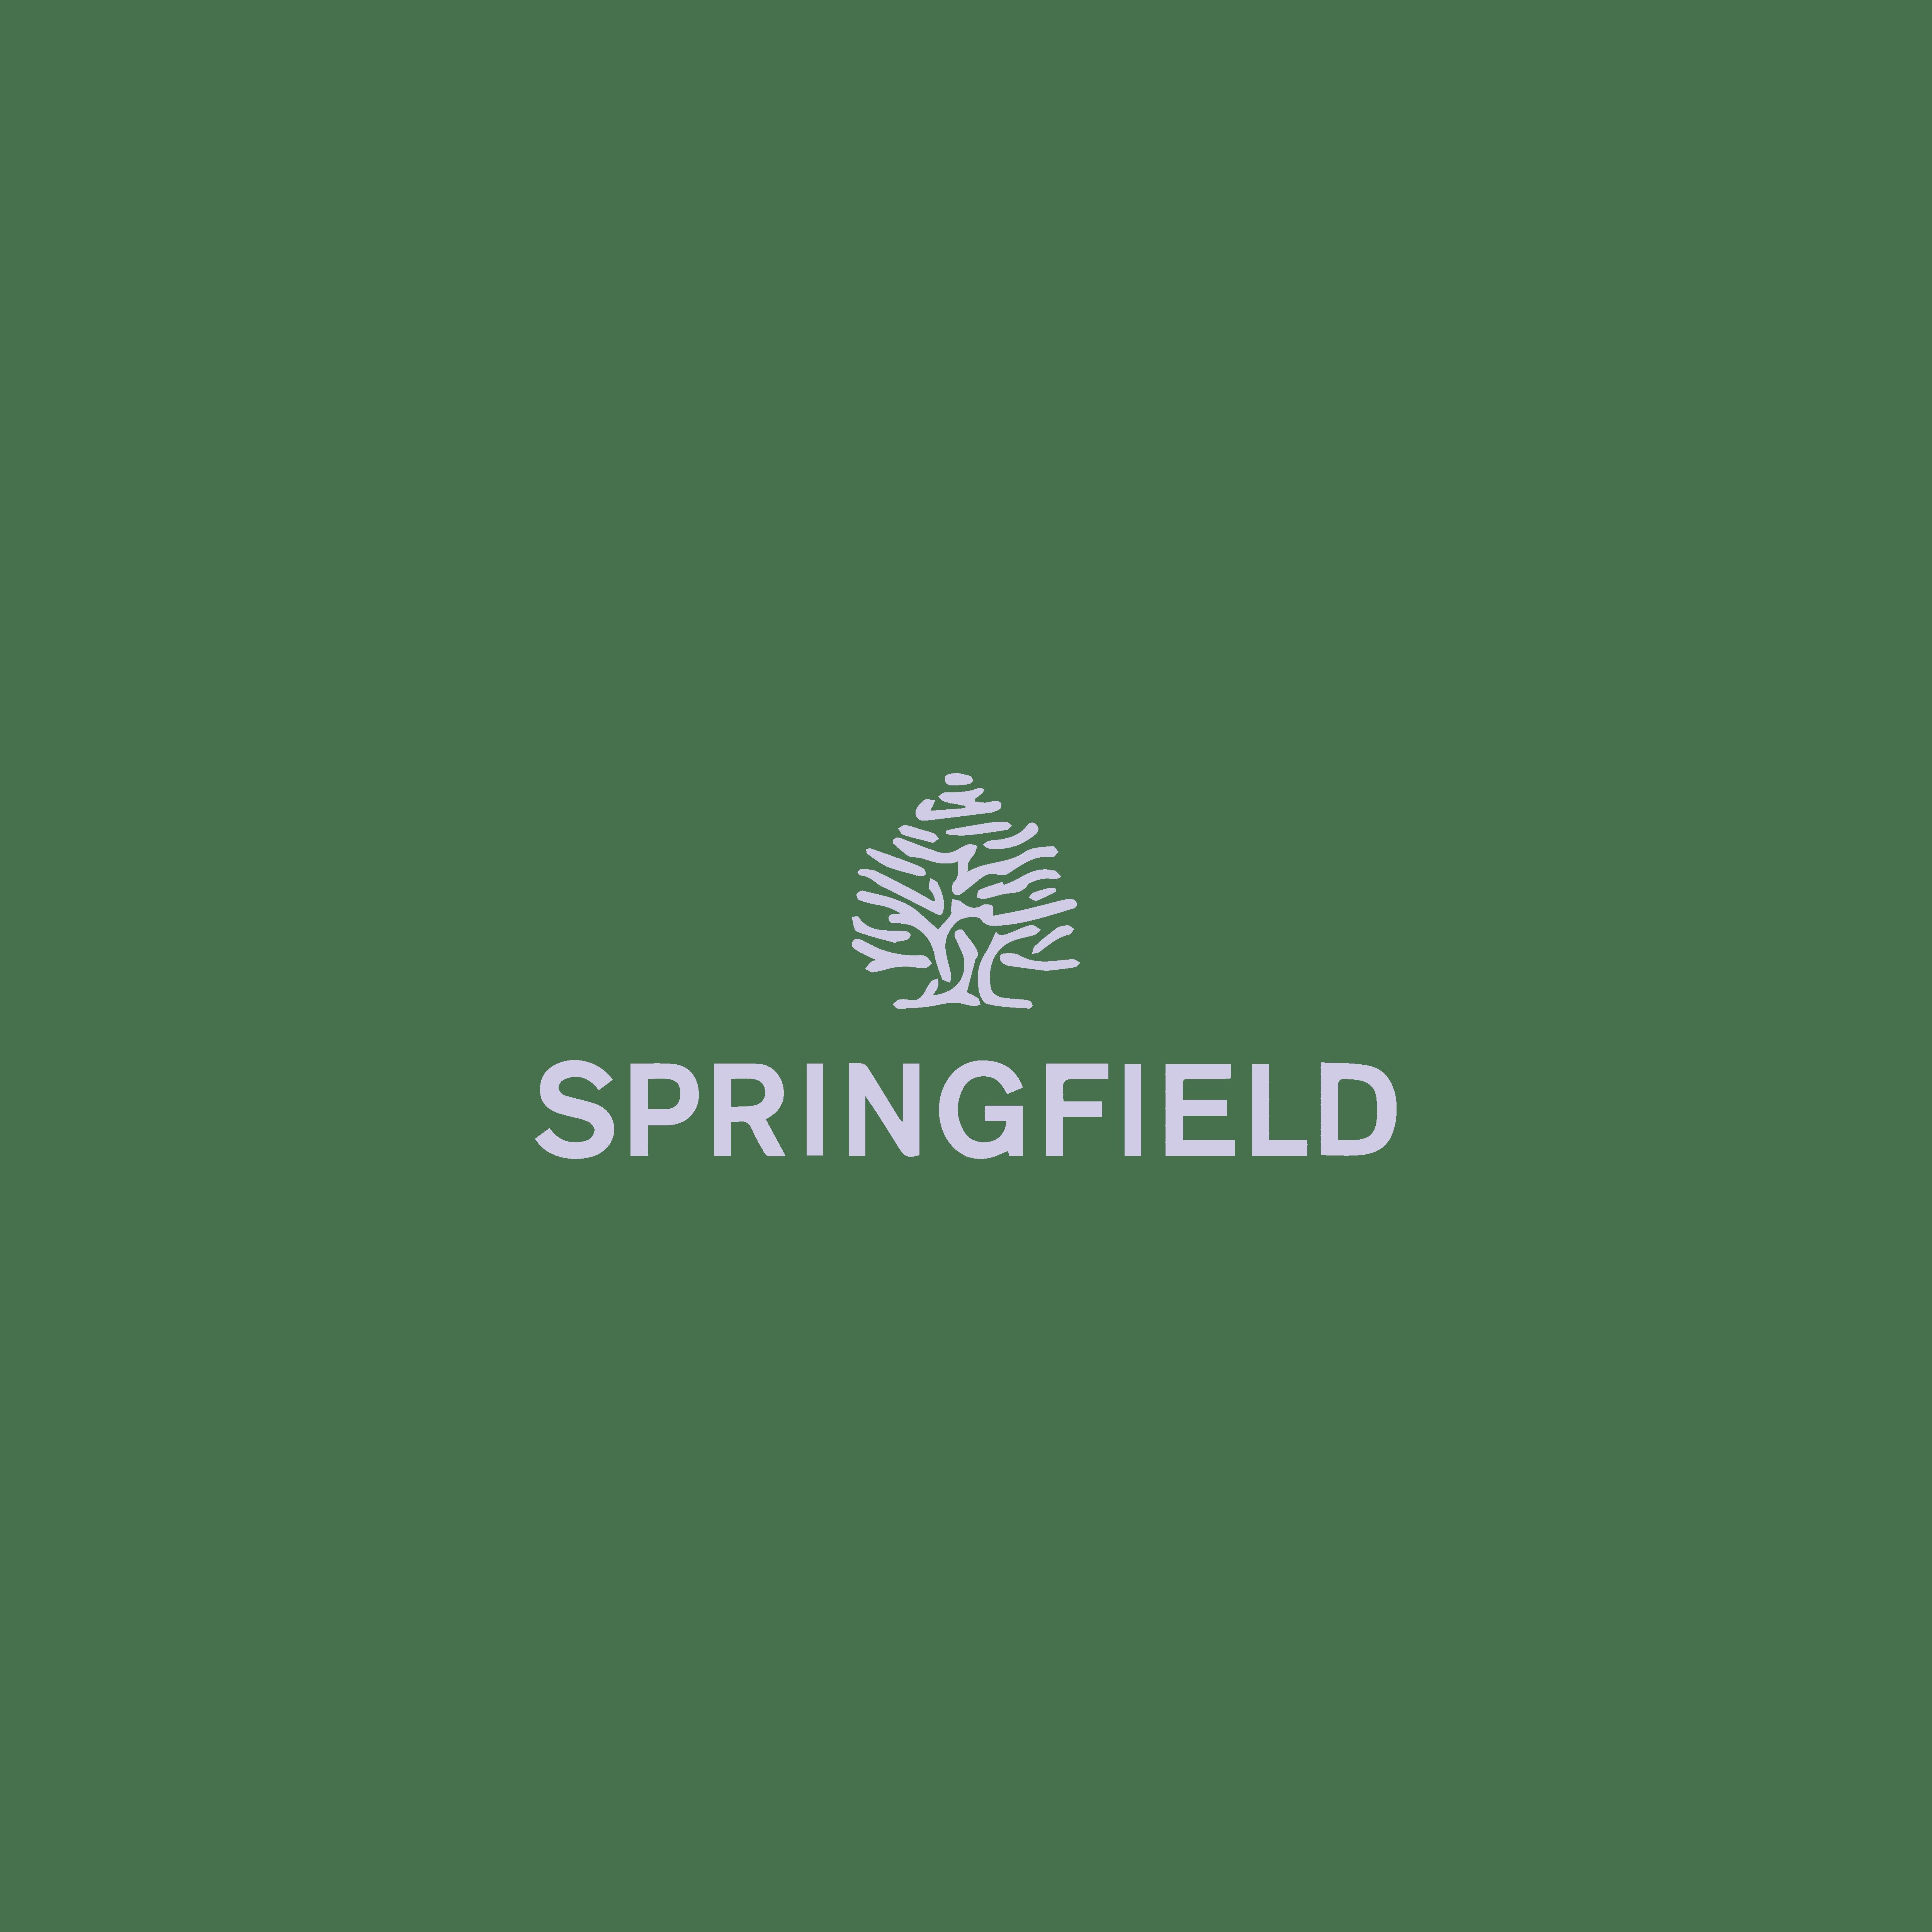 springfield planable customer logo